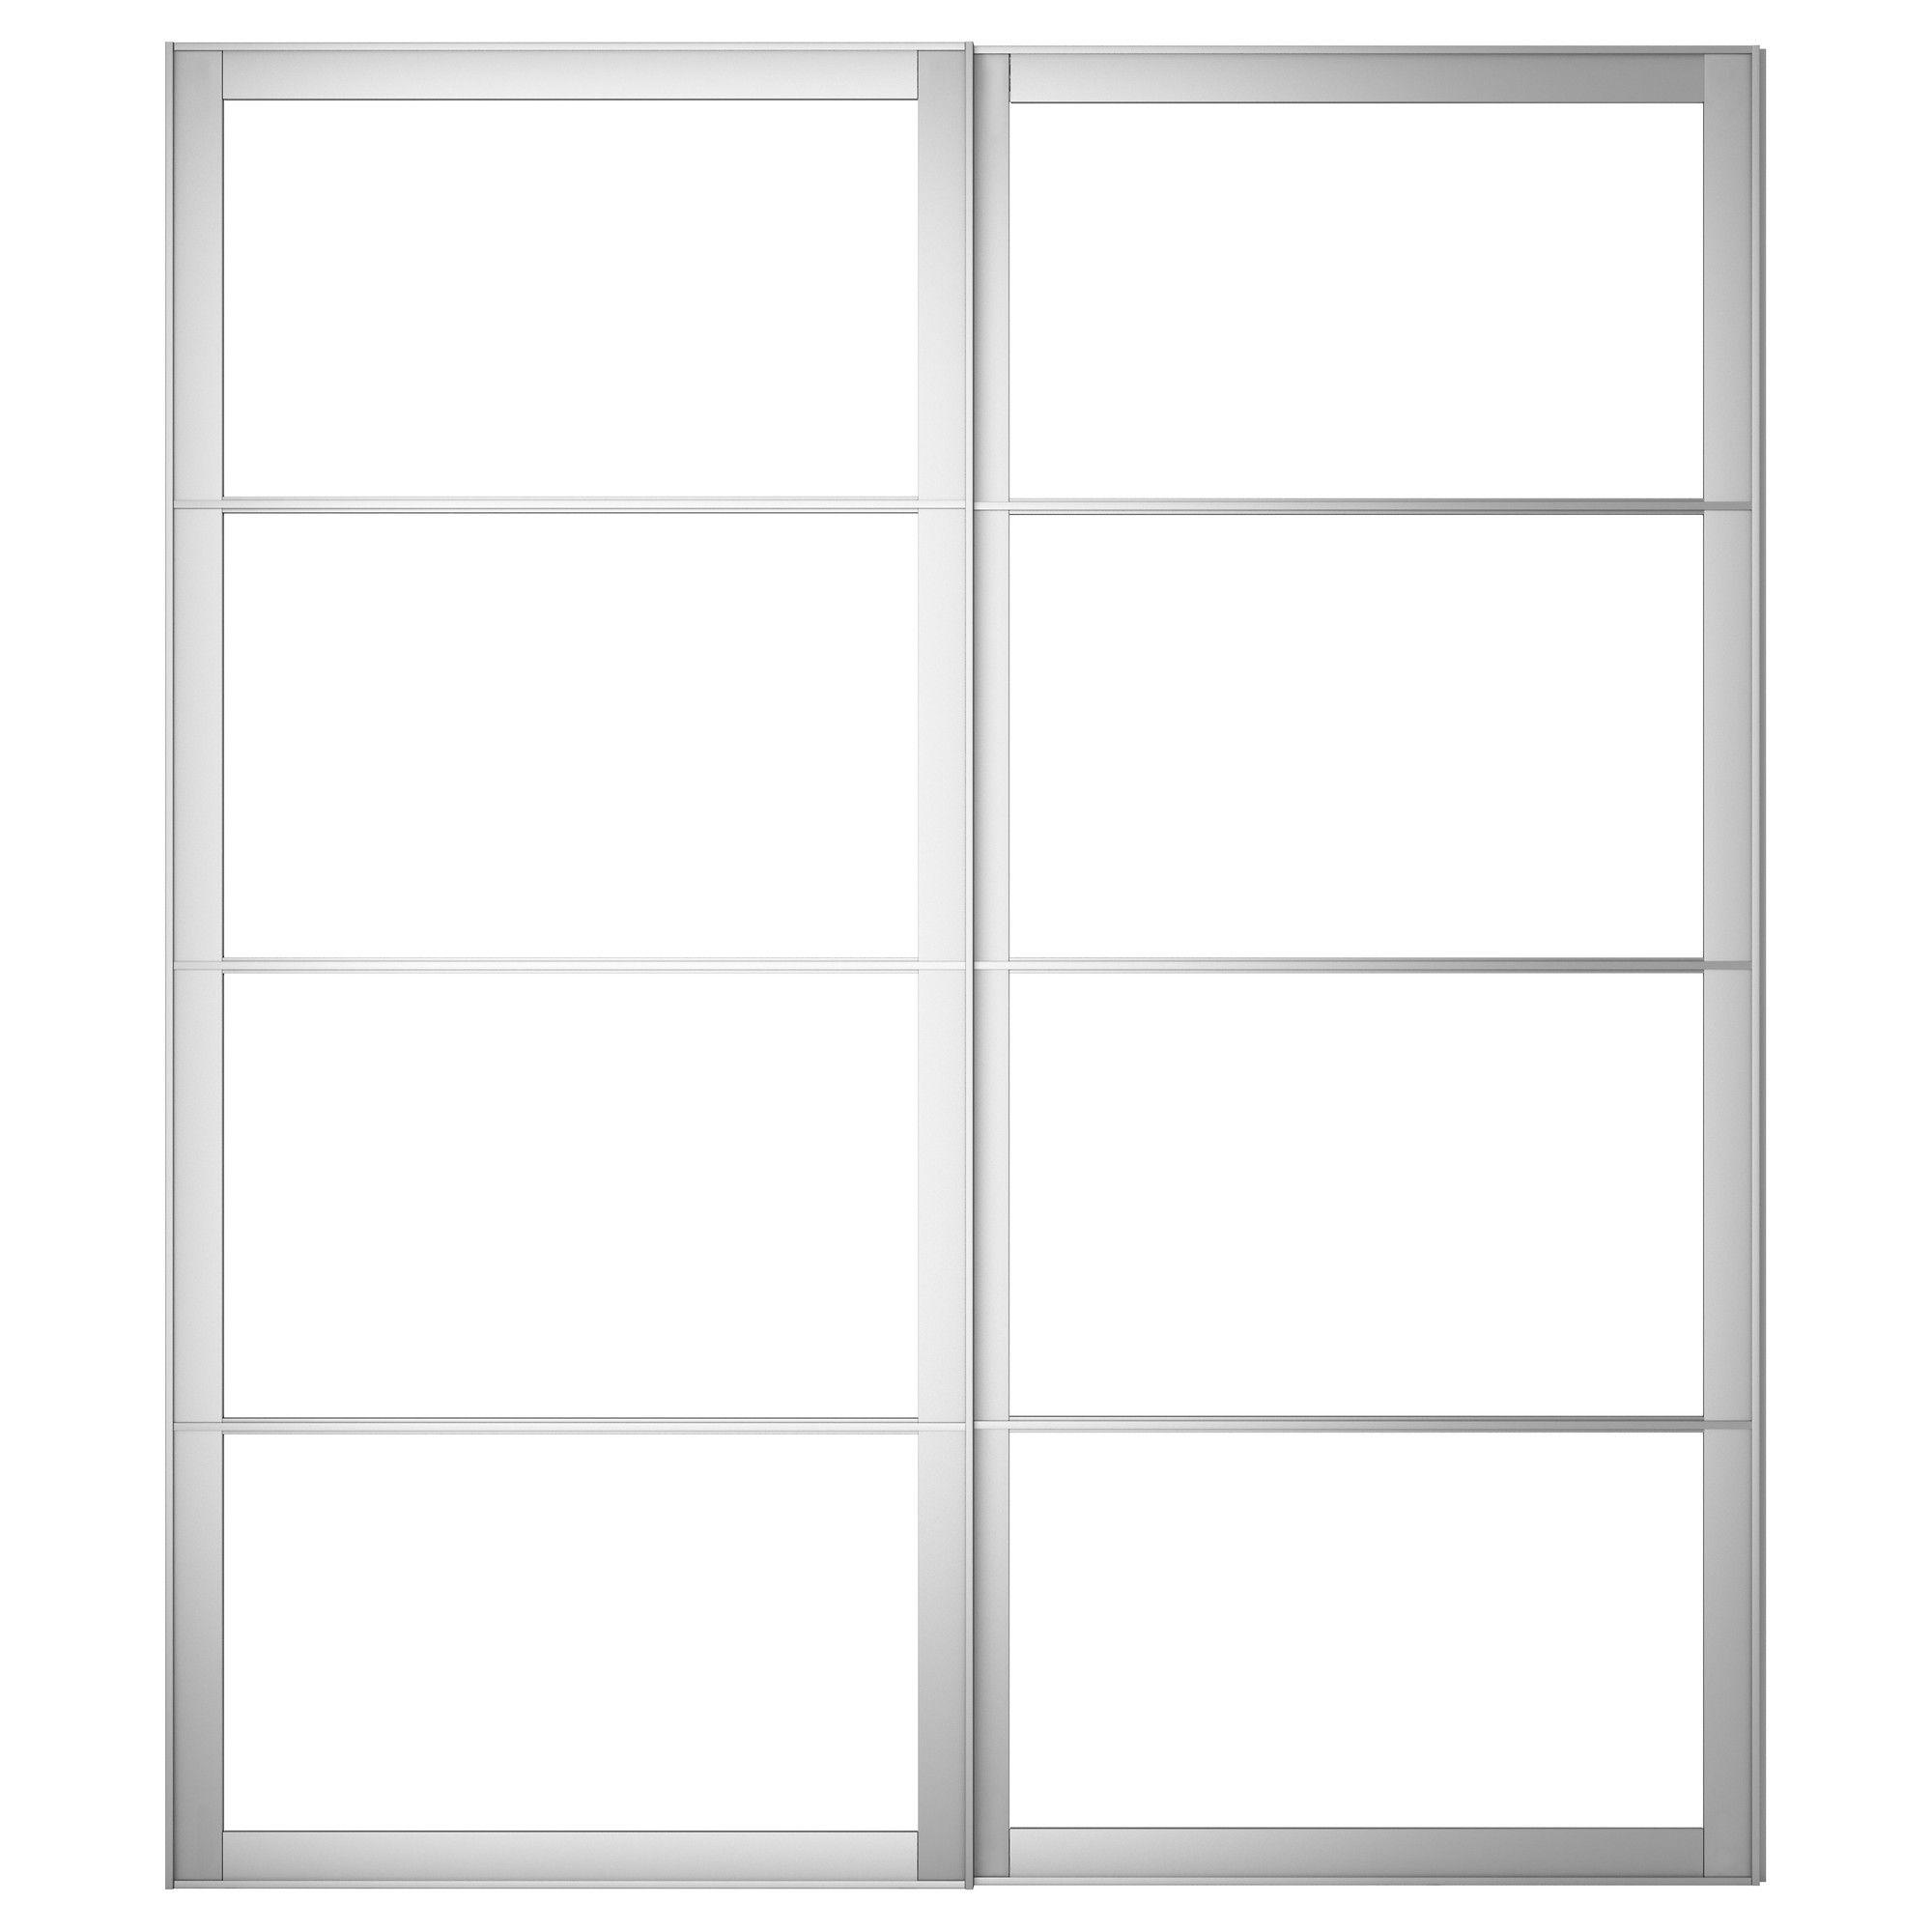 Pax pair of sliding door frames rail aluminum ikea for Pannelli scorrevoli ikea